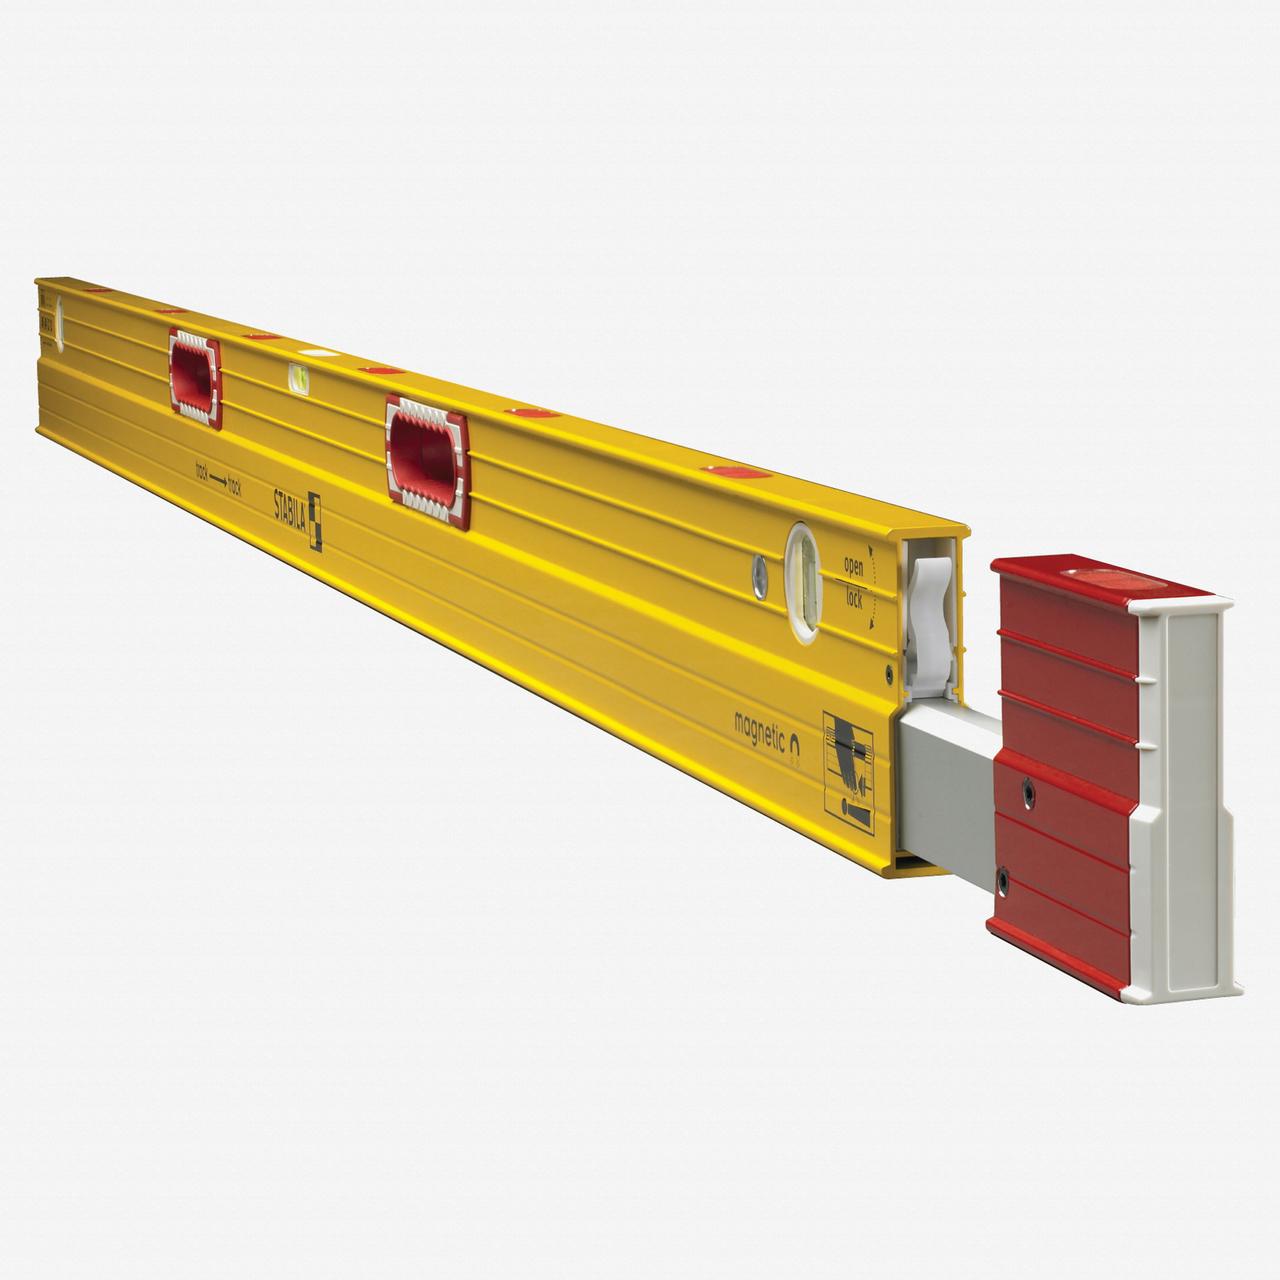 Stabila 34610 Type 106TM Magnetic Extendable Plate Level, 6'-10' - KC Tool